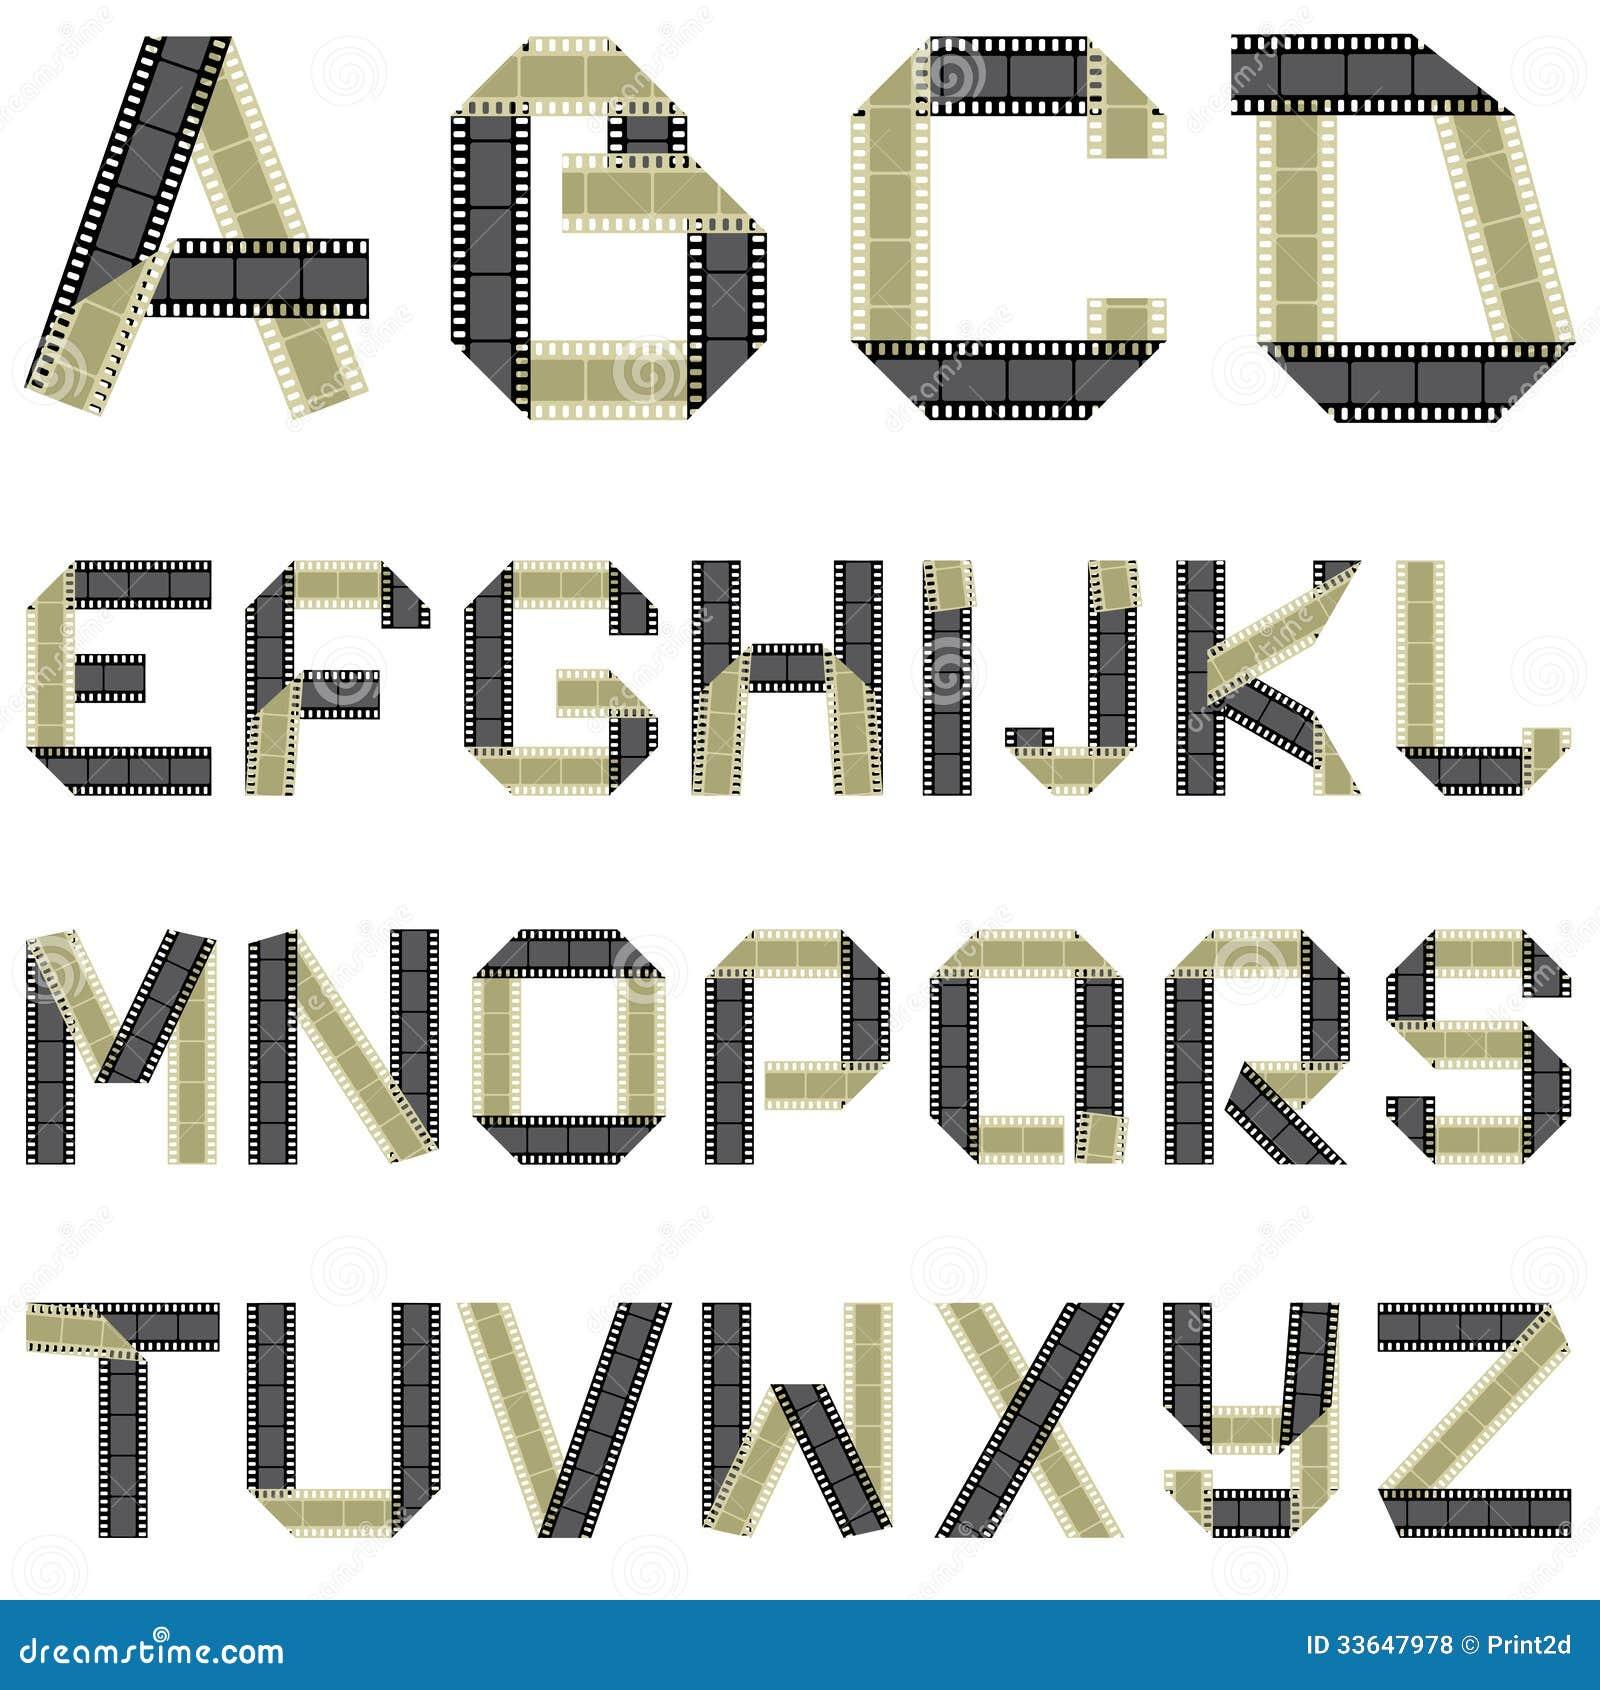 abc film tape stock illustration image of decoration 33647978. Black Bedroom Furniture Sets. Home Design Ideas